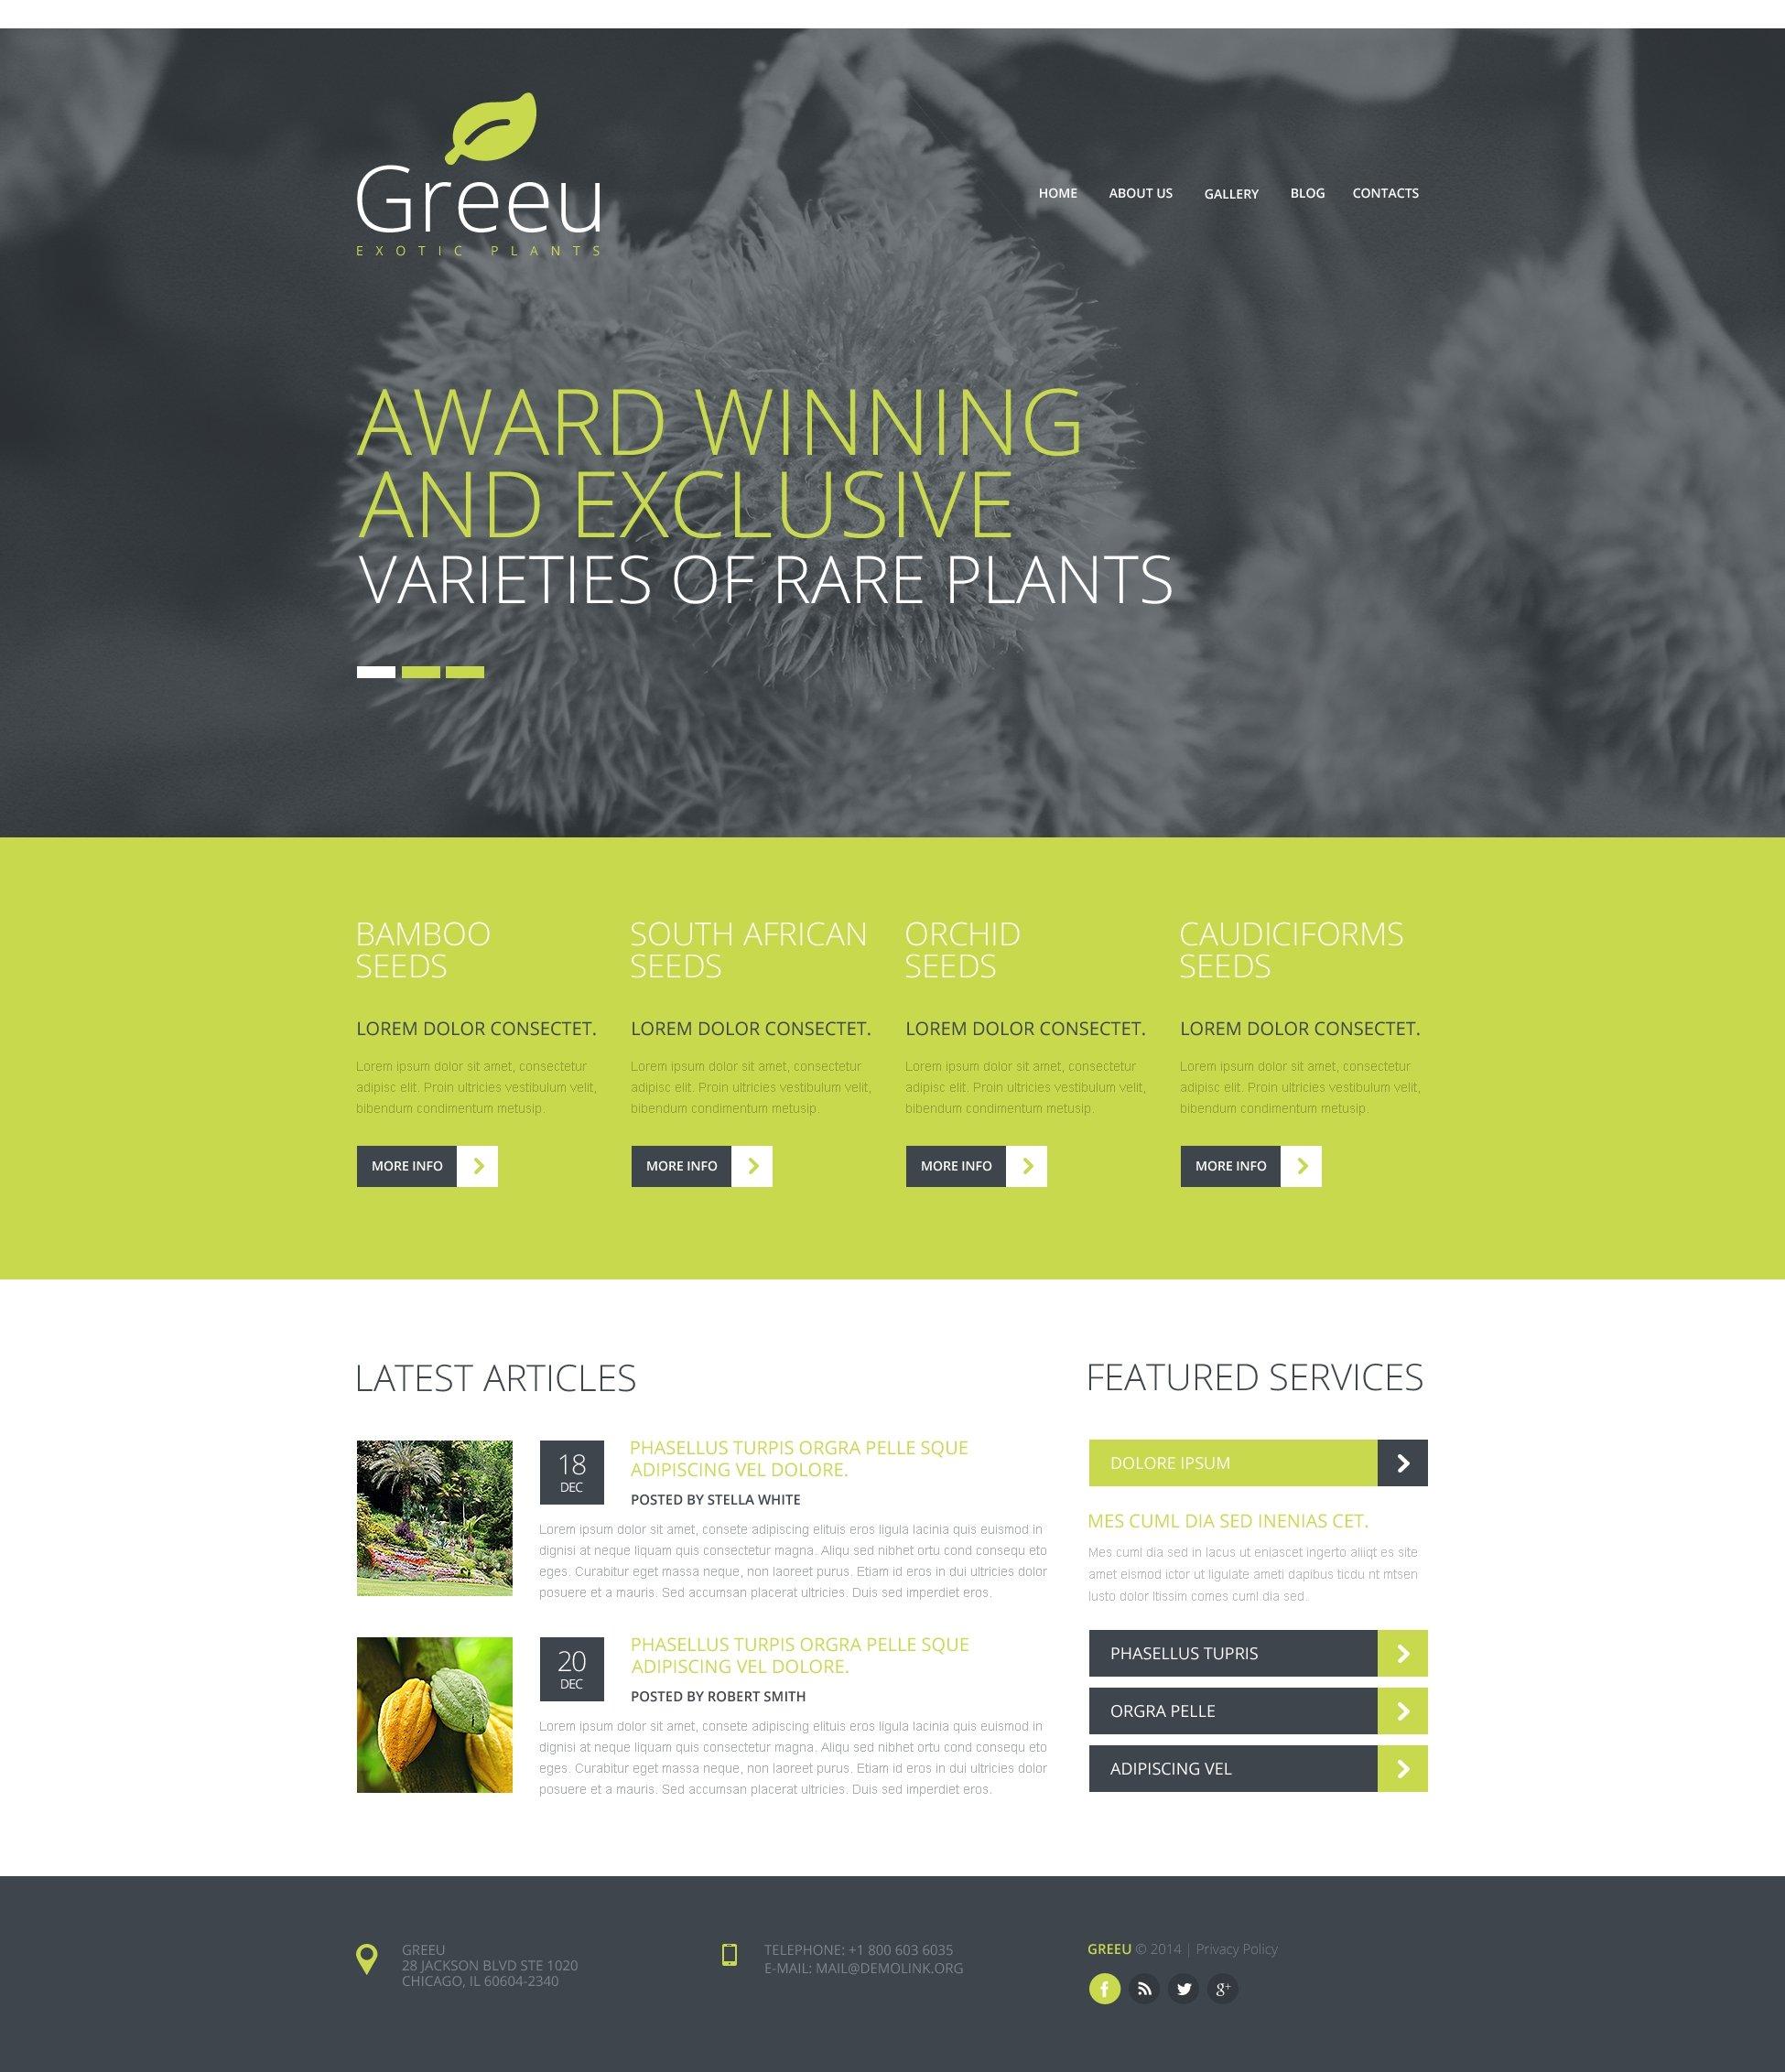 Thème Joomla adaptatif pour site de design de jardin #49509 - screenshot